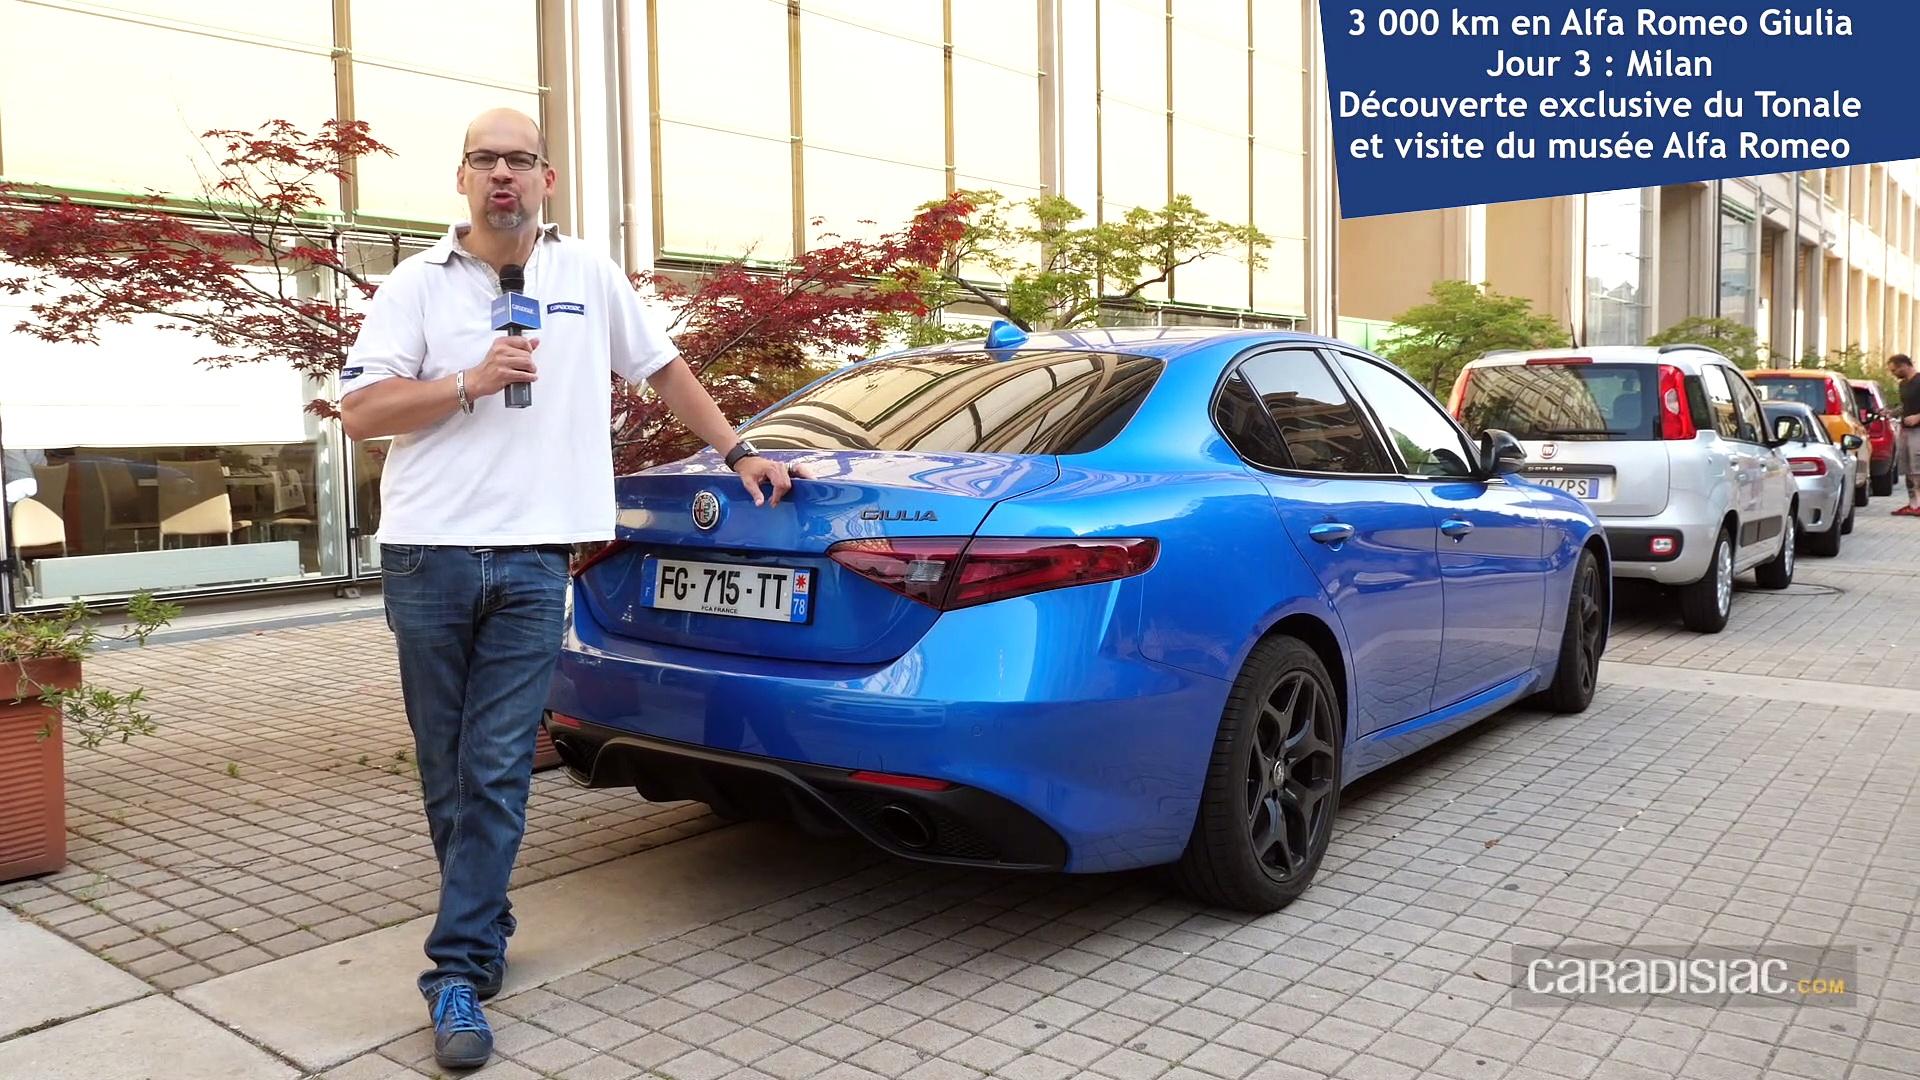 Essai longue durée : 3 000 km en Alfa Romeo Giulia : bella machina